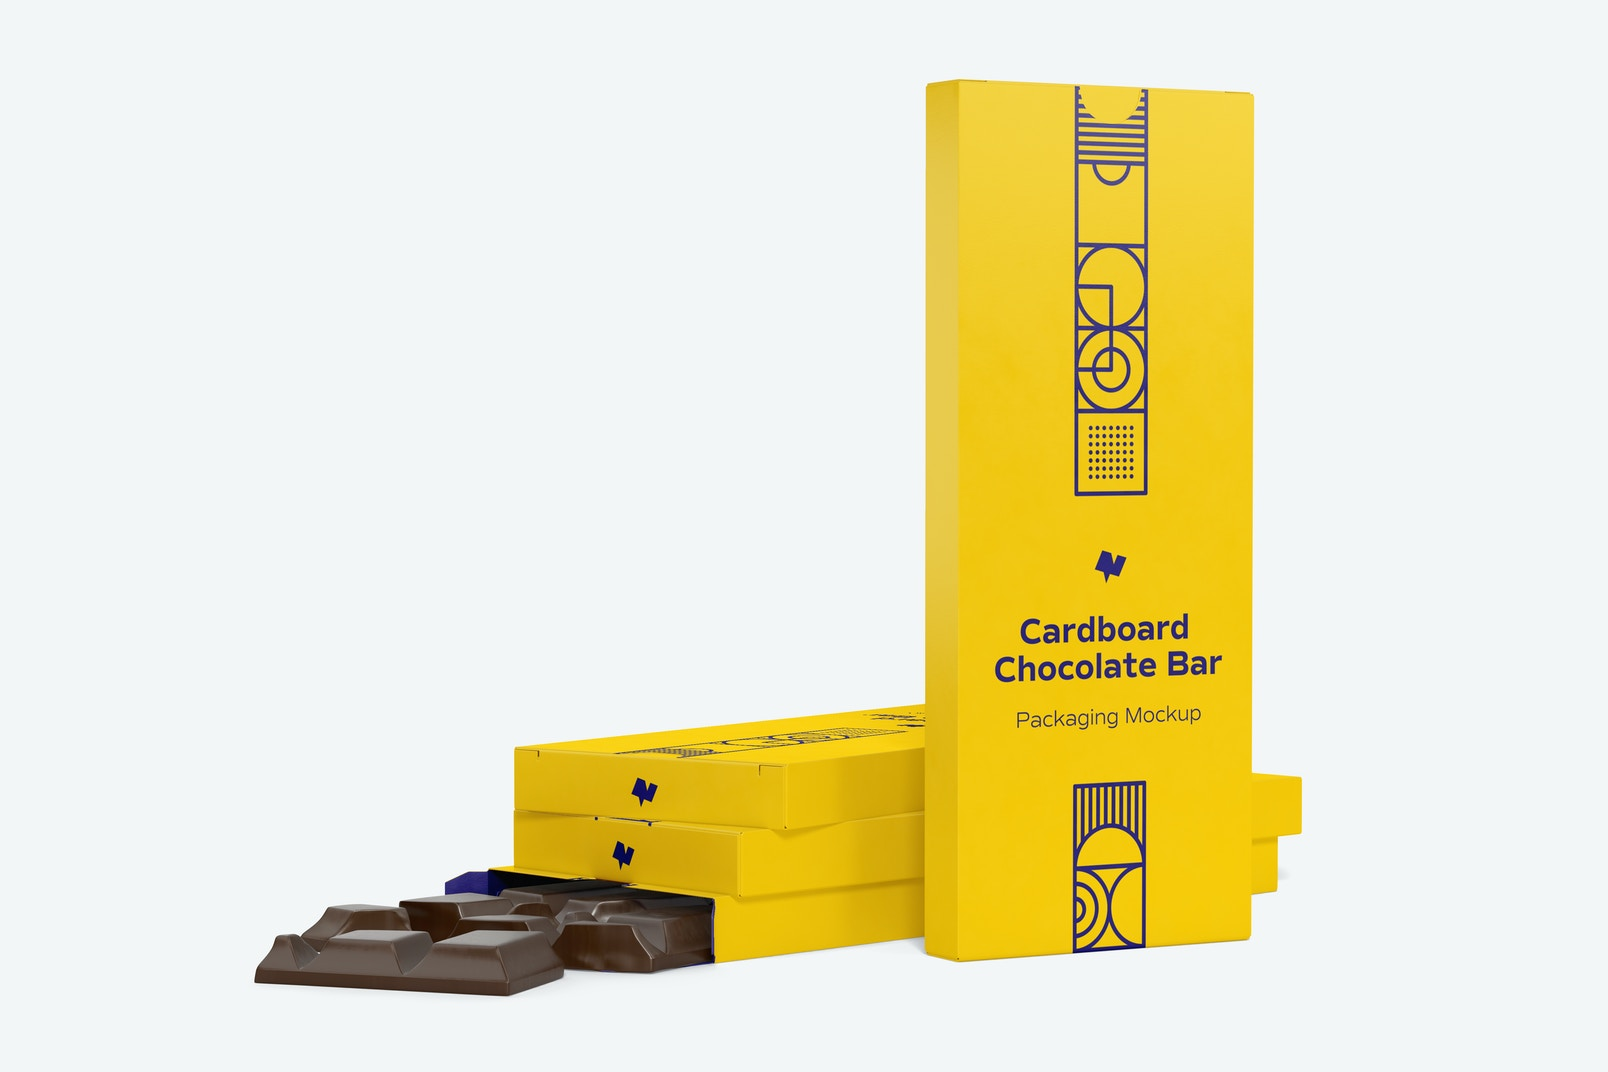 Cardboard Chocolate Bar Packaging Mockup, Right View